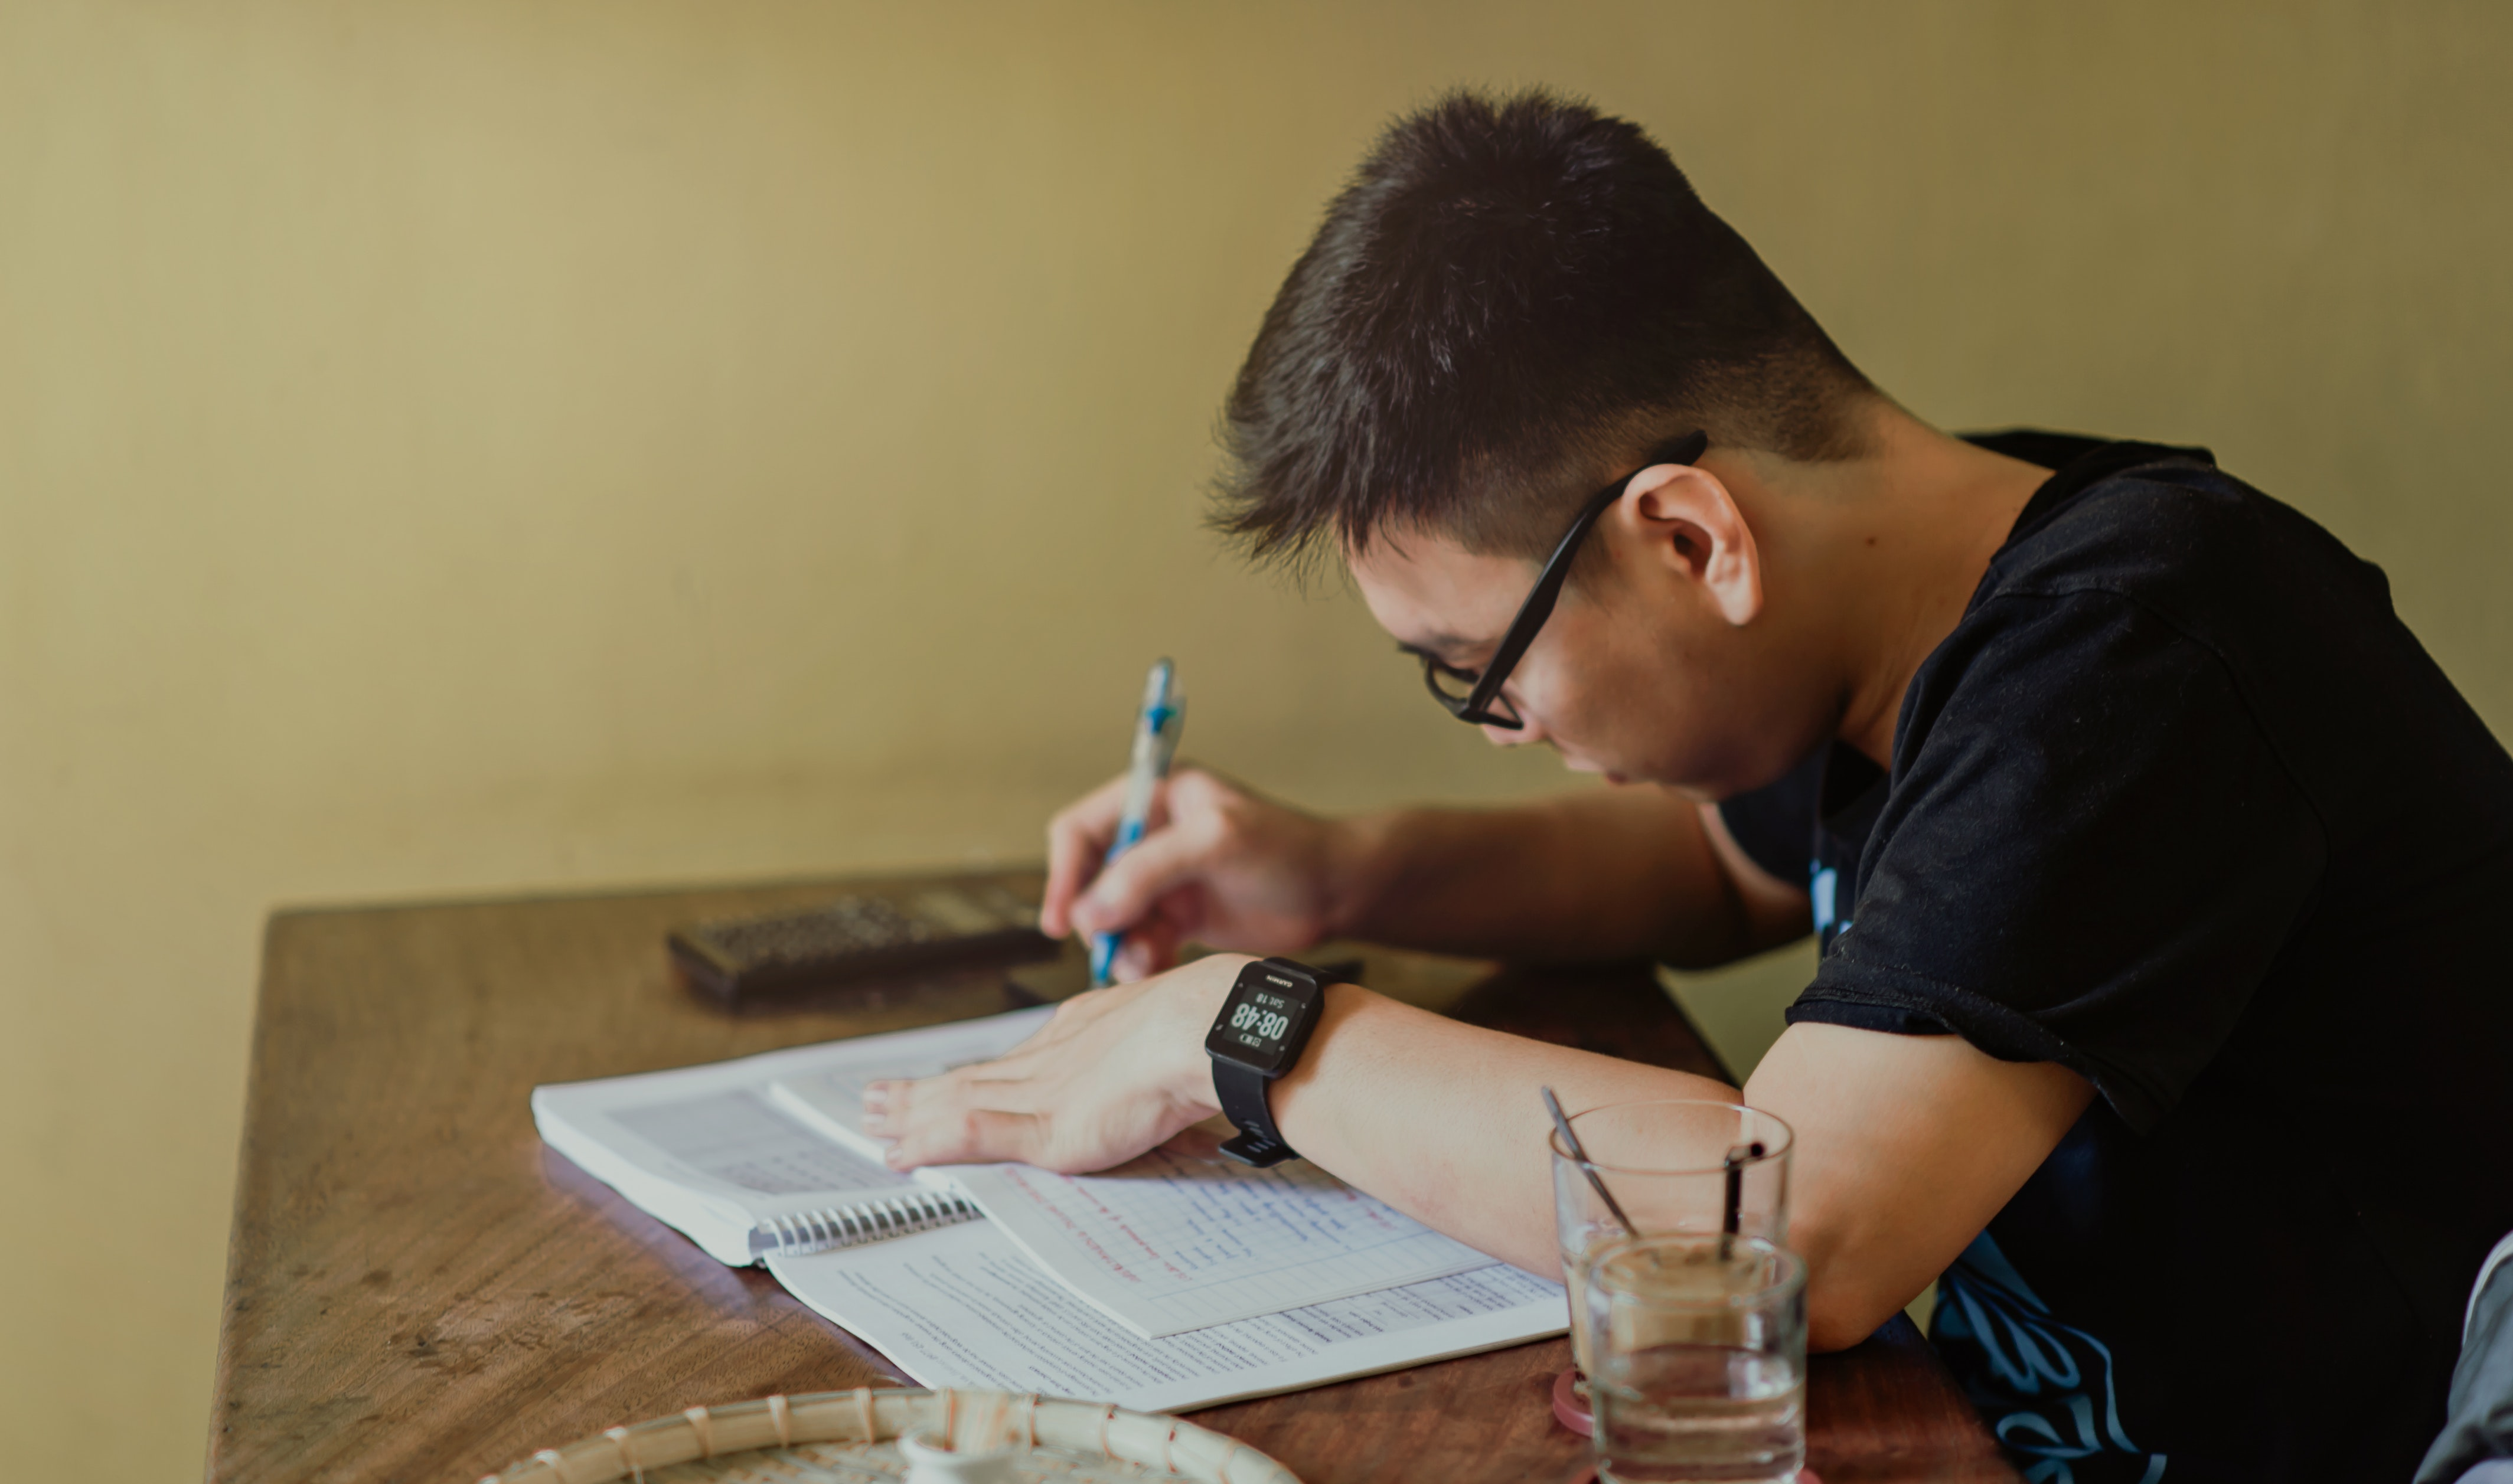 Man in black shirt sitting and writing photo